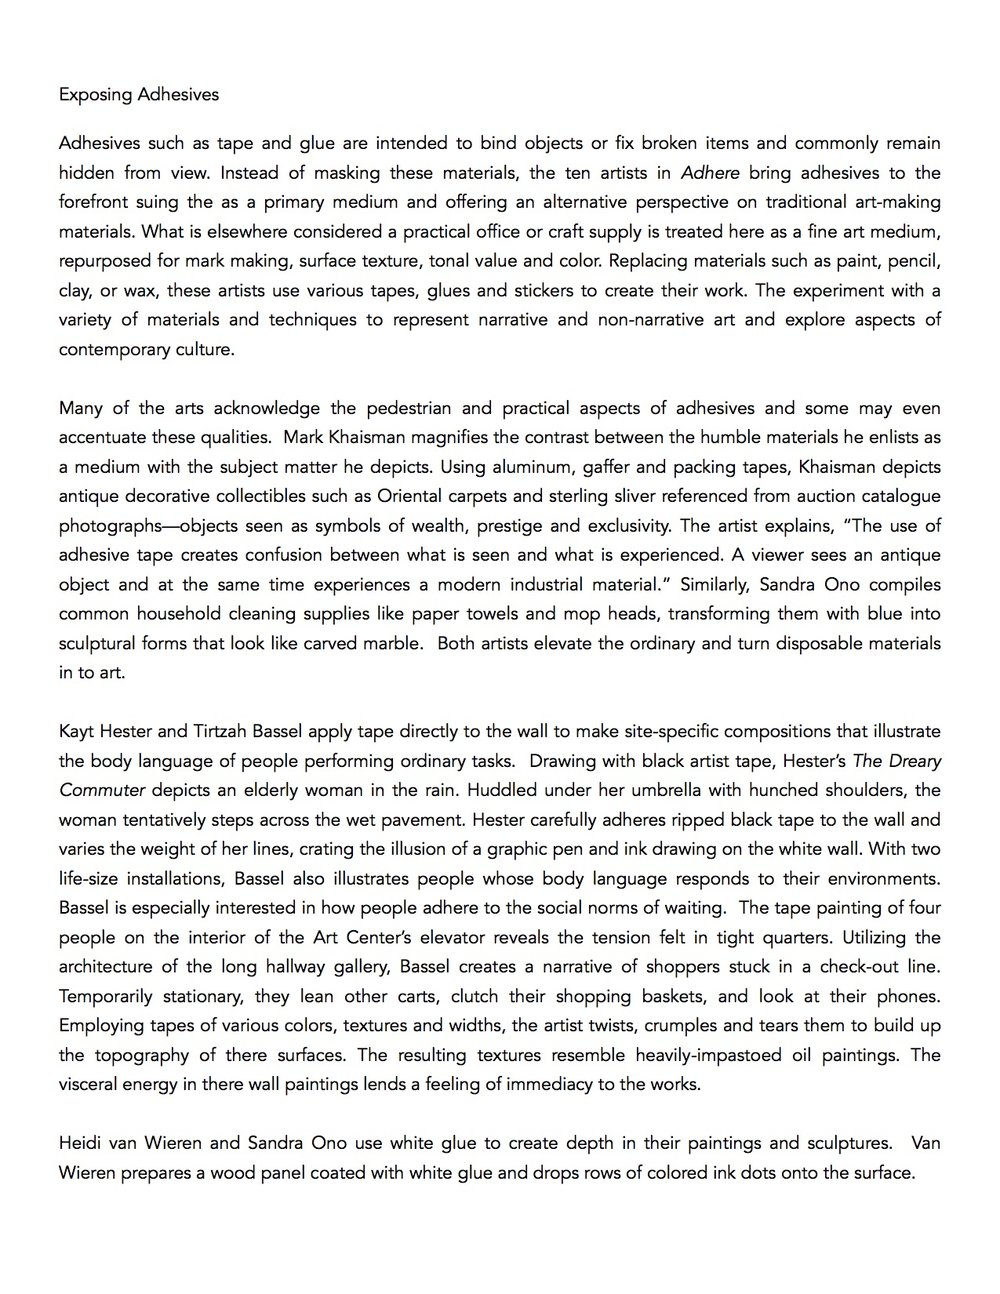 ExposingAdhesives_Essay_Pg1.jpg